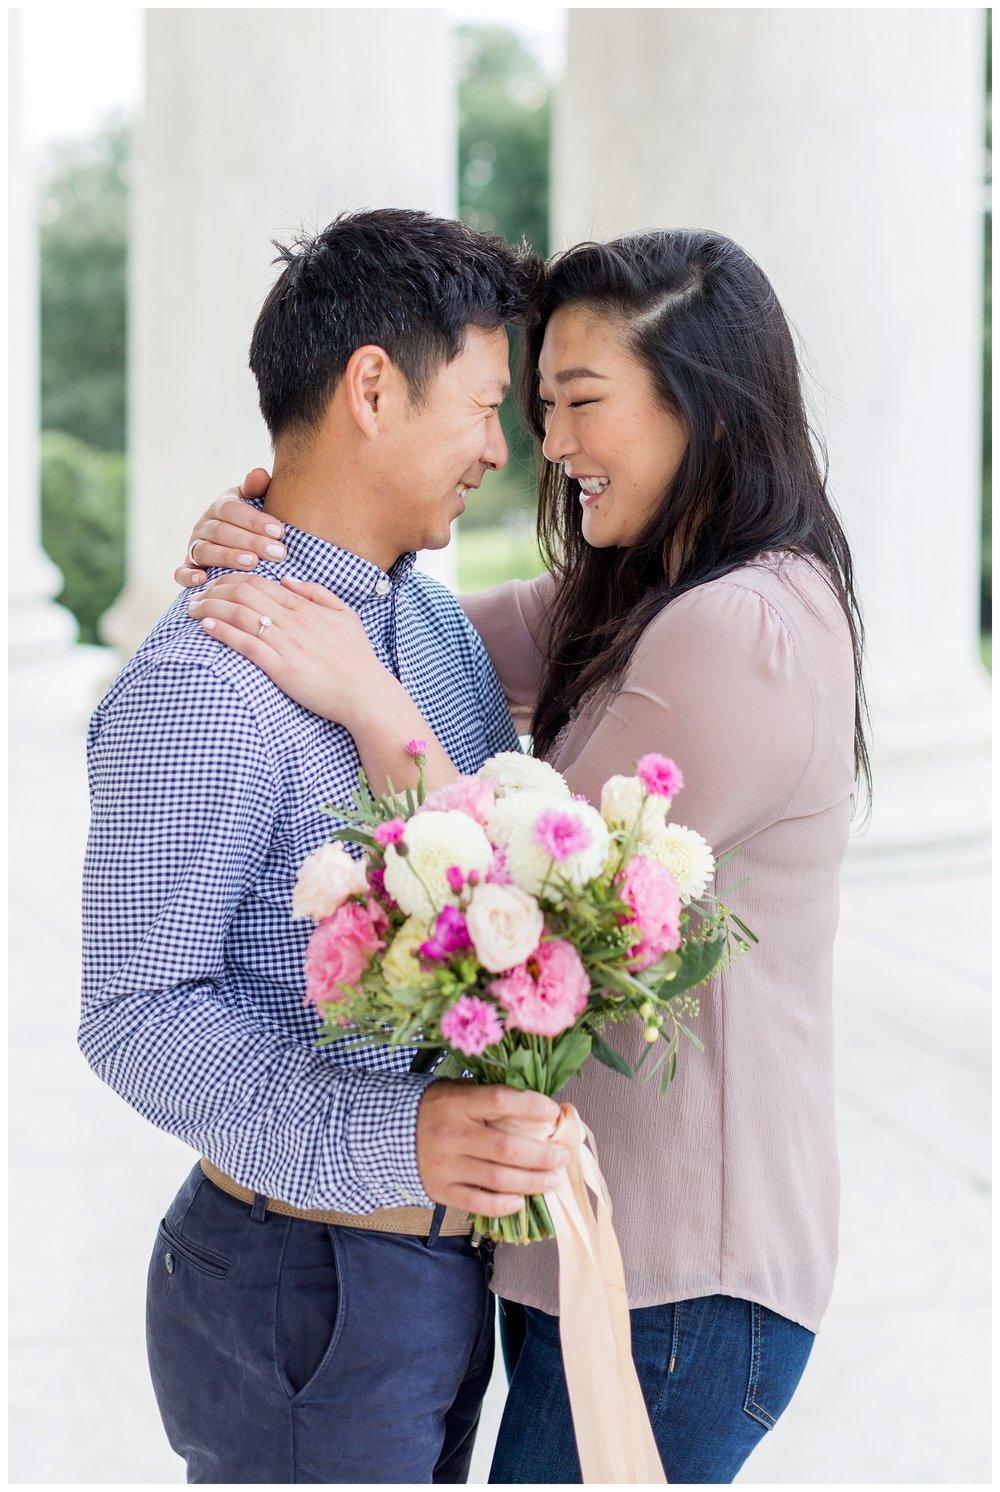 Thomas Jefferson Memorial Engagement DC Wedding Photographer Kir Tuben_0016.jpg